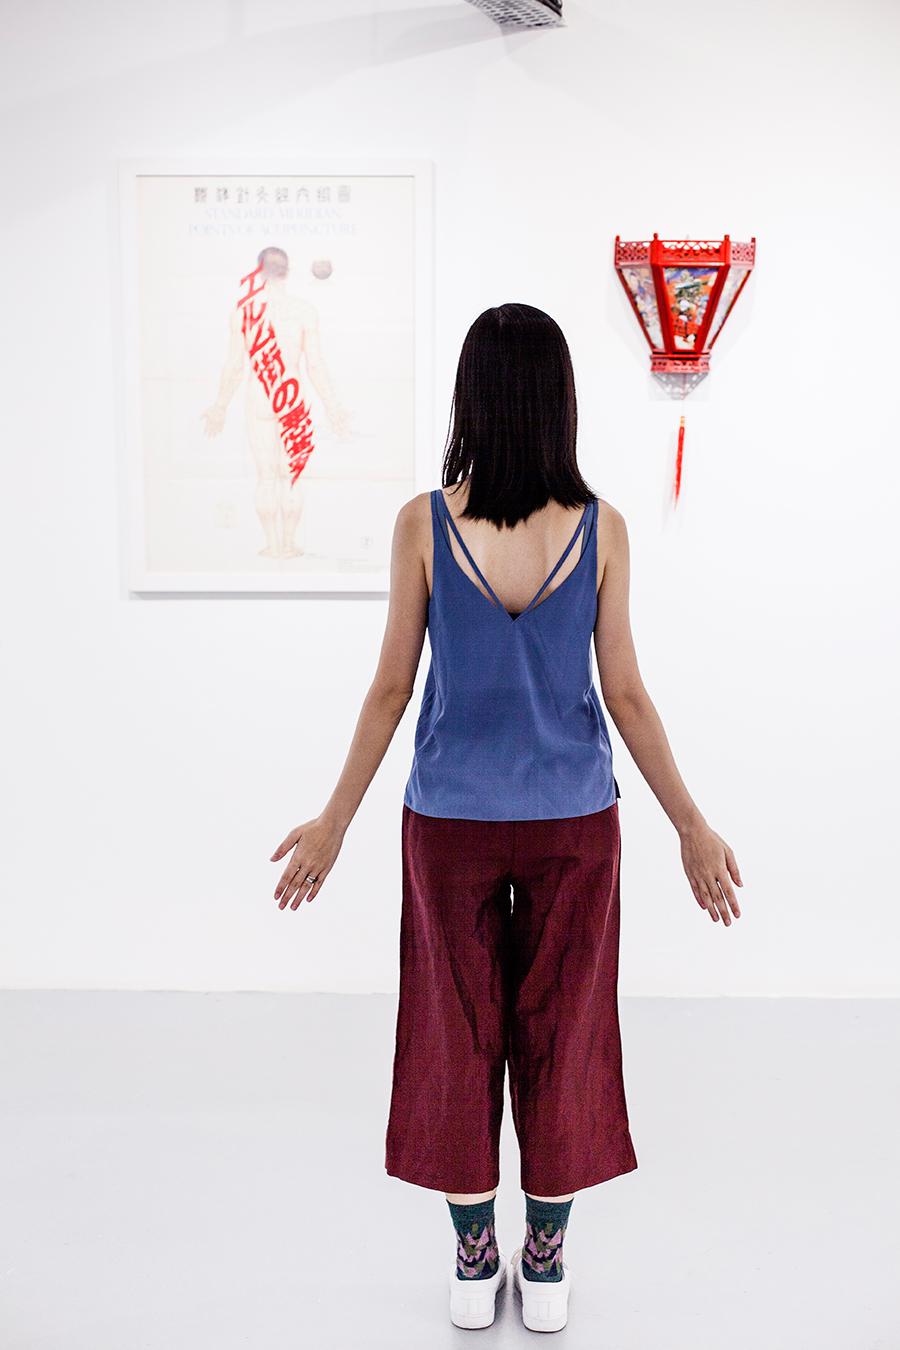 Mojoko 'Sick Scents' exhibition at Chan + Hori Contemporary, Singapore.